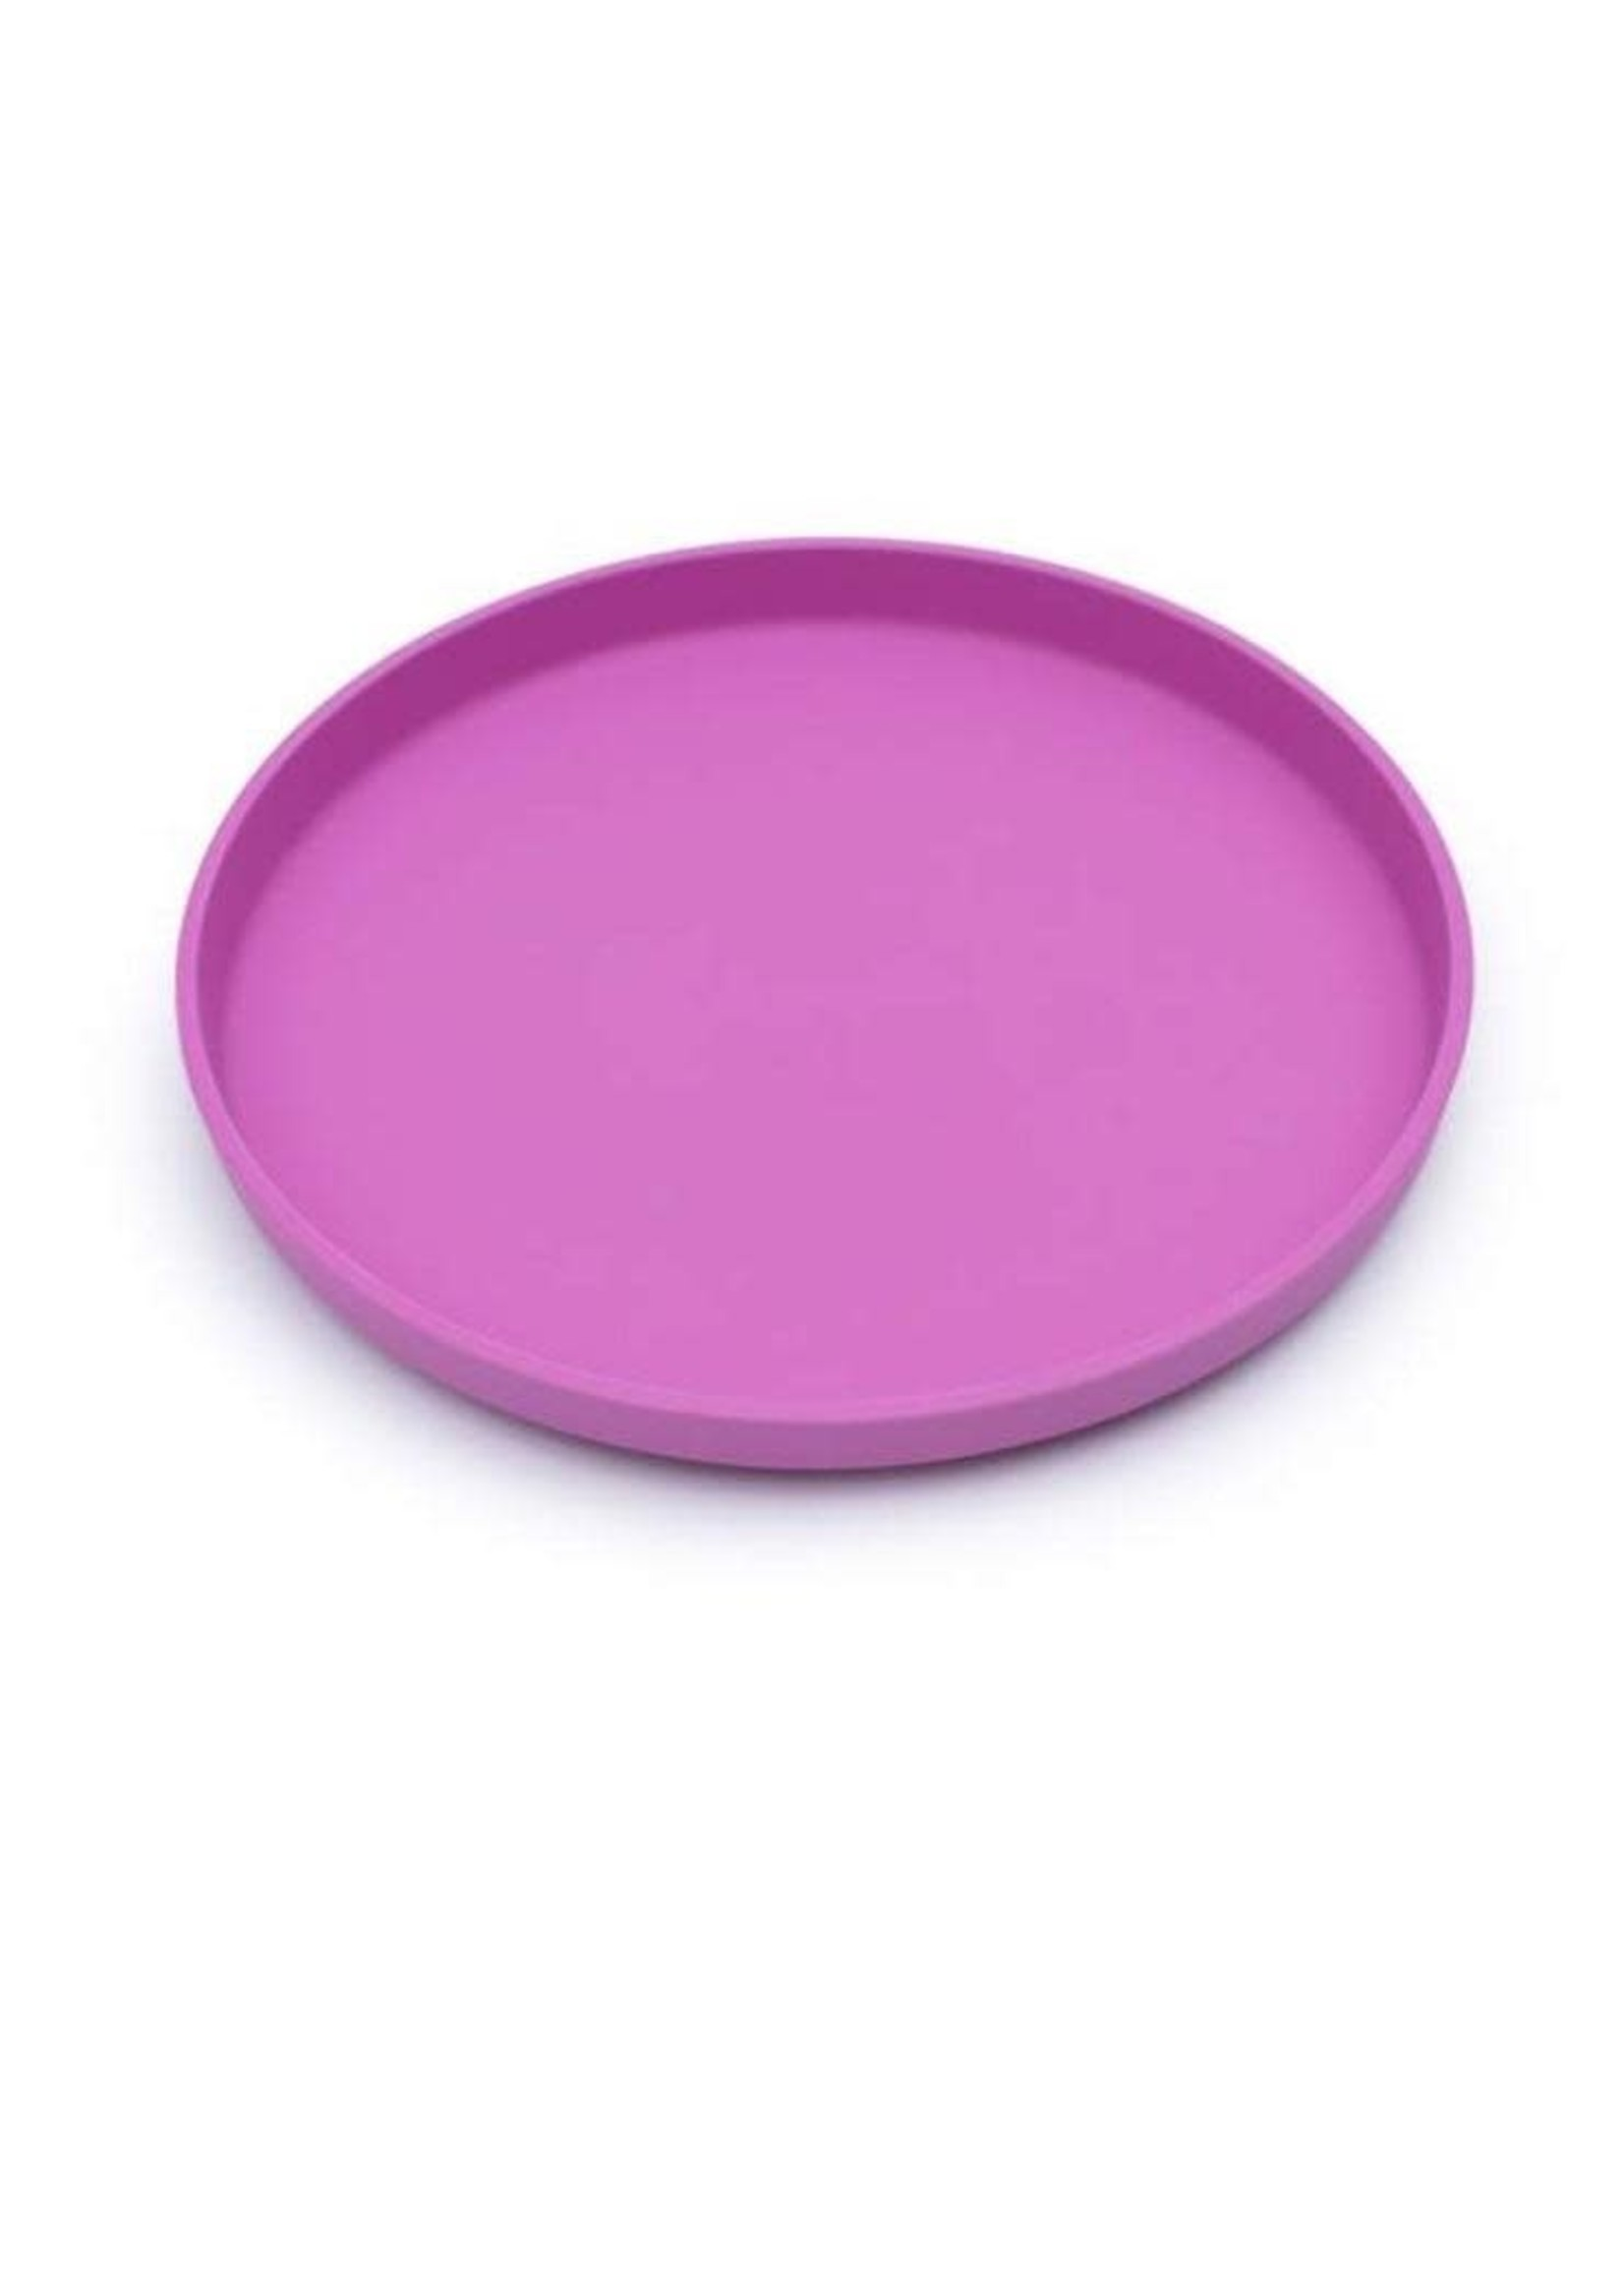 Bobo & Boo Bobo & Boo Plant-Based Plate